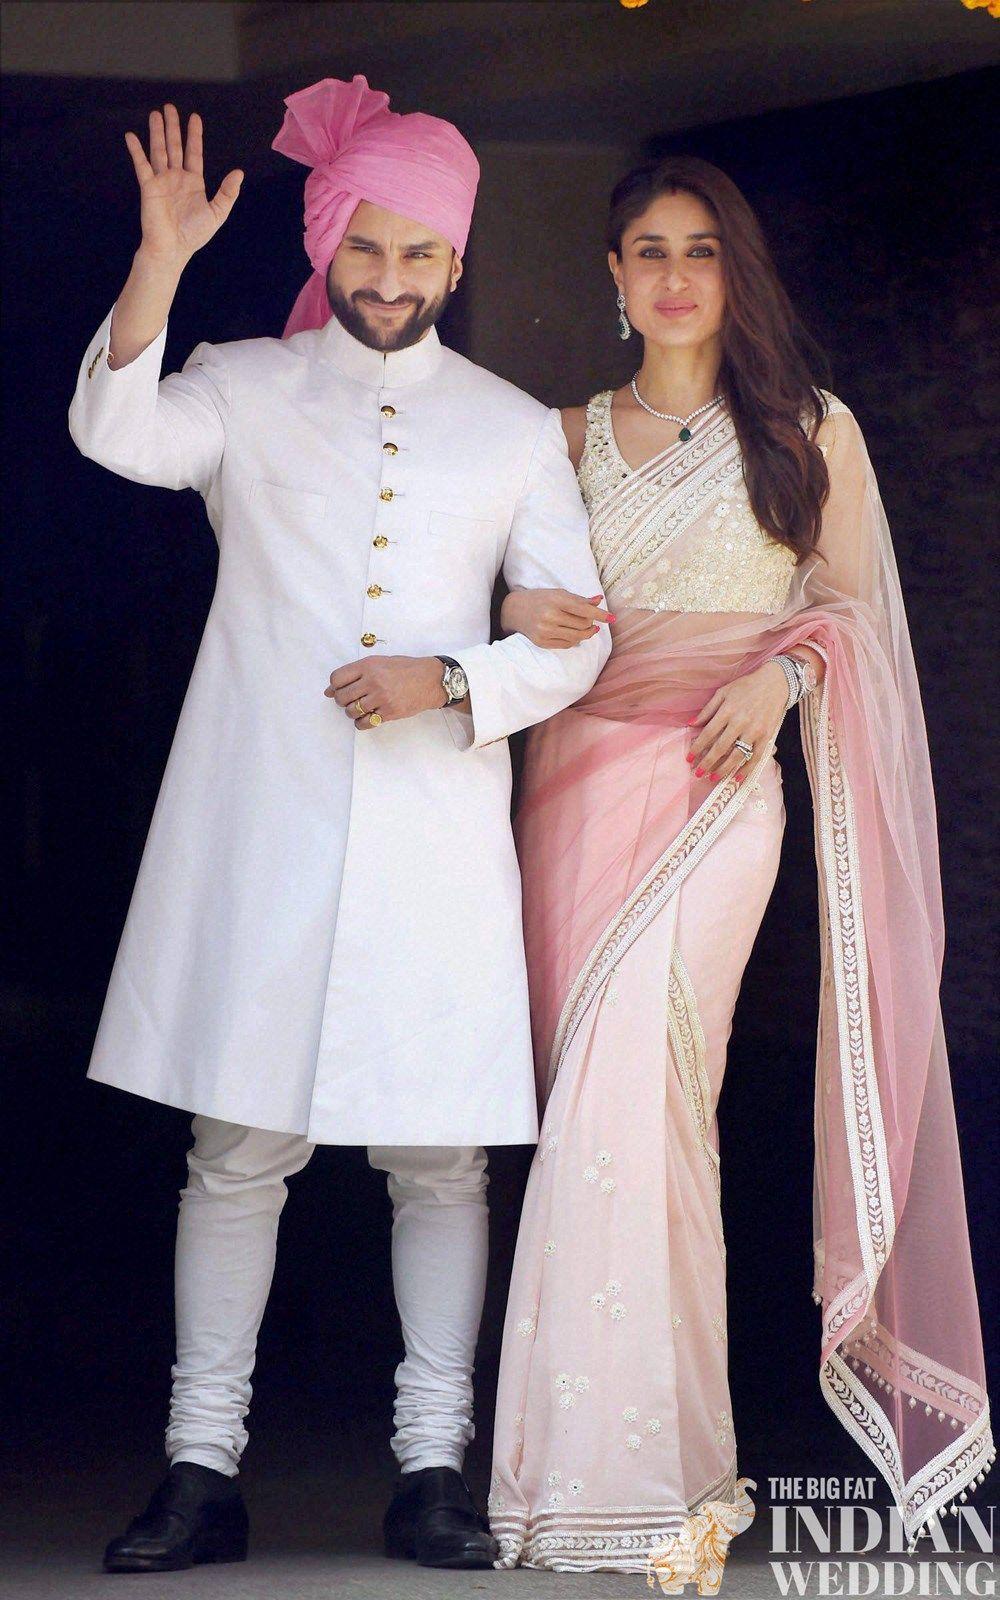 Saif Ali Khan S Nawabi Sherwani Style Along Wit Kareena Kapoor Simple Yet Elegant Pink And